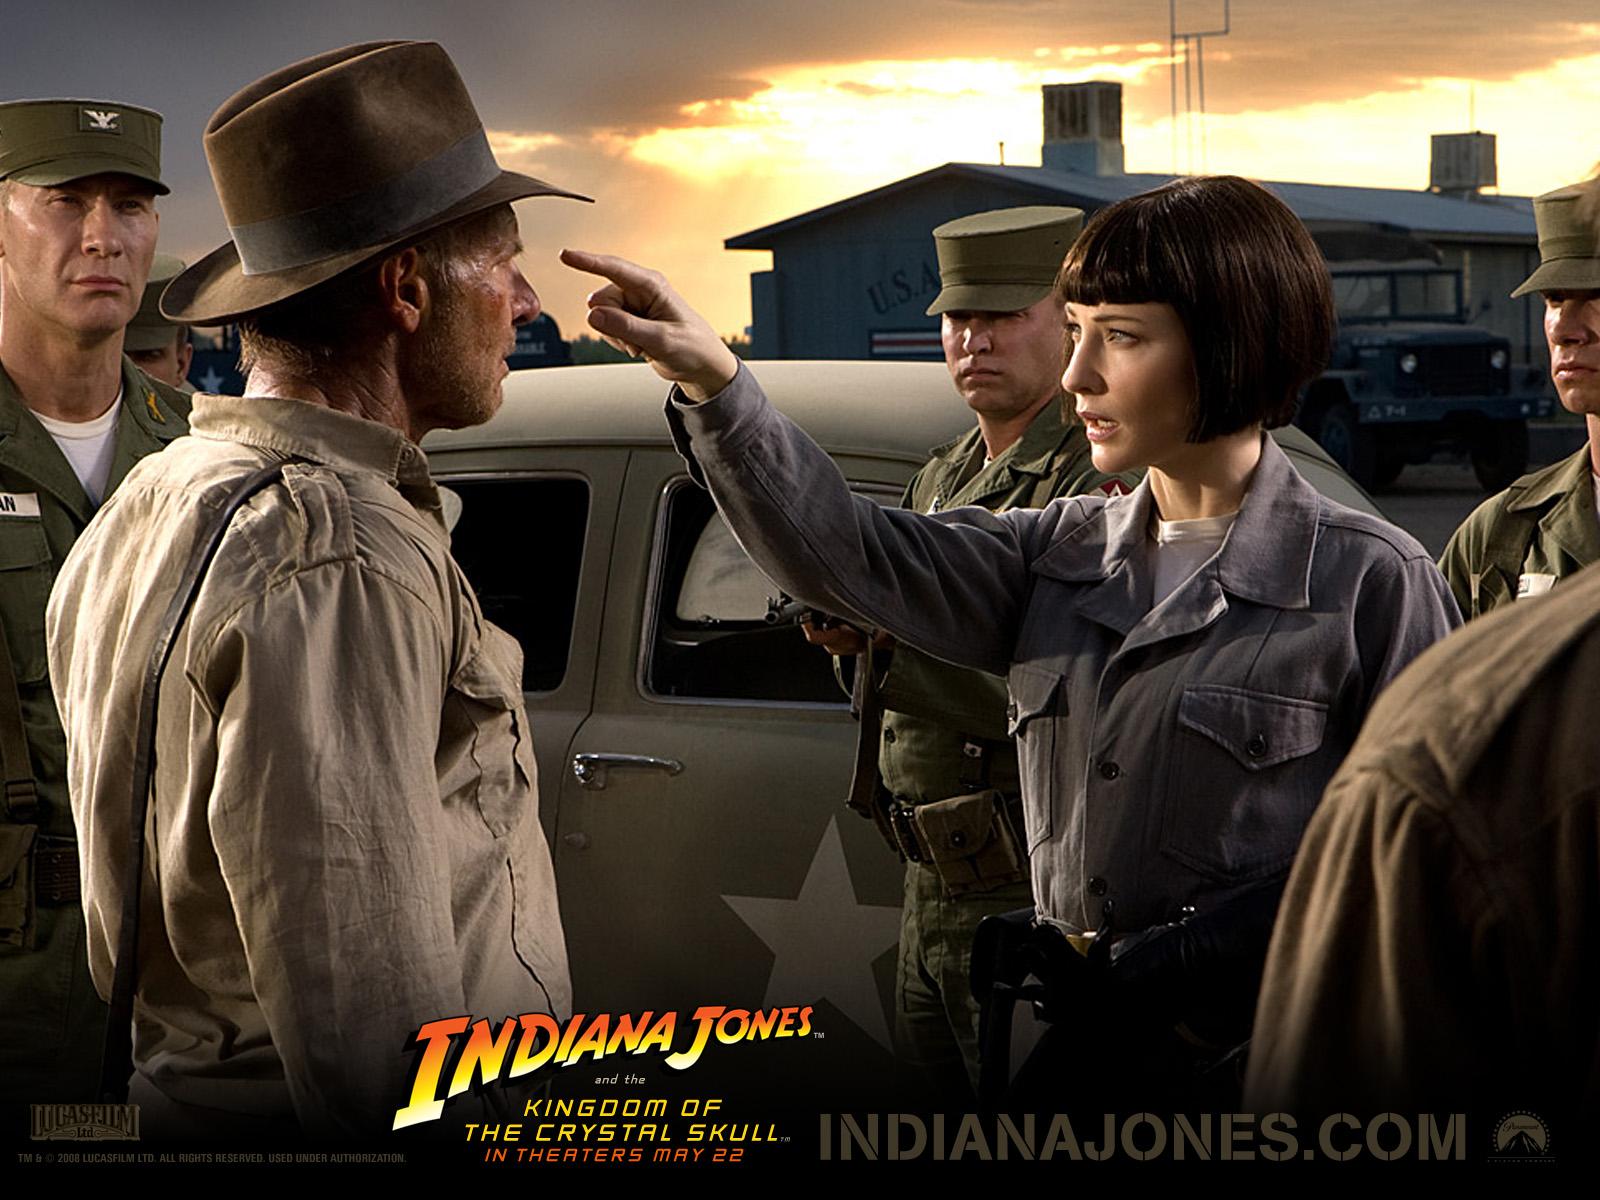 Desktop Wallpapers Indiana Jones Indiana Jones and the Kingdom of the Crystal Skull Movies film